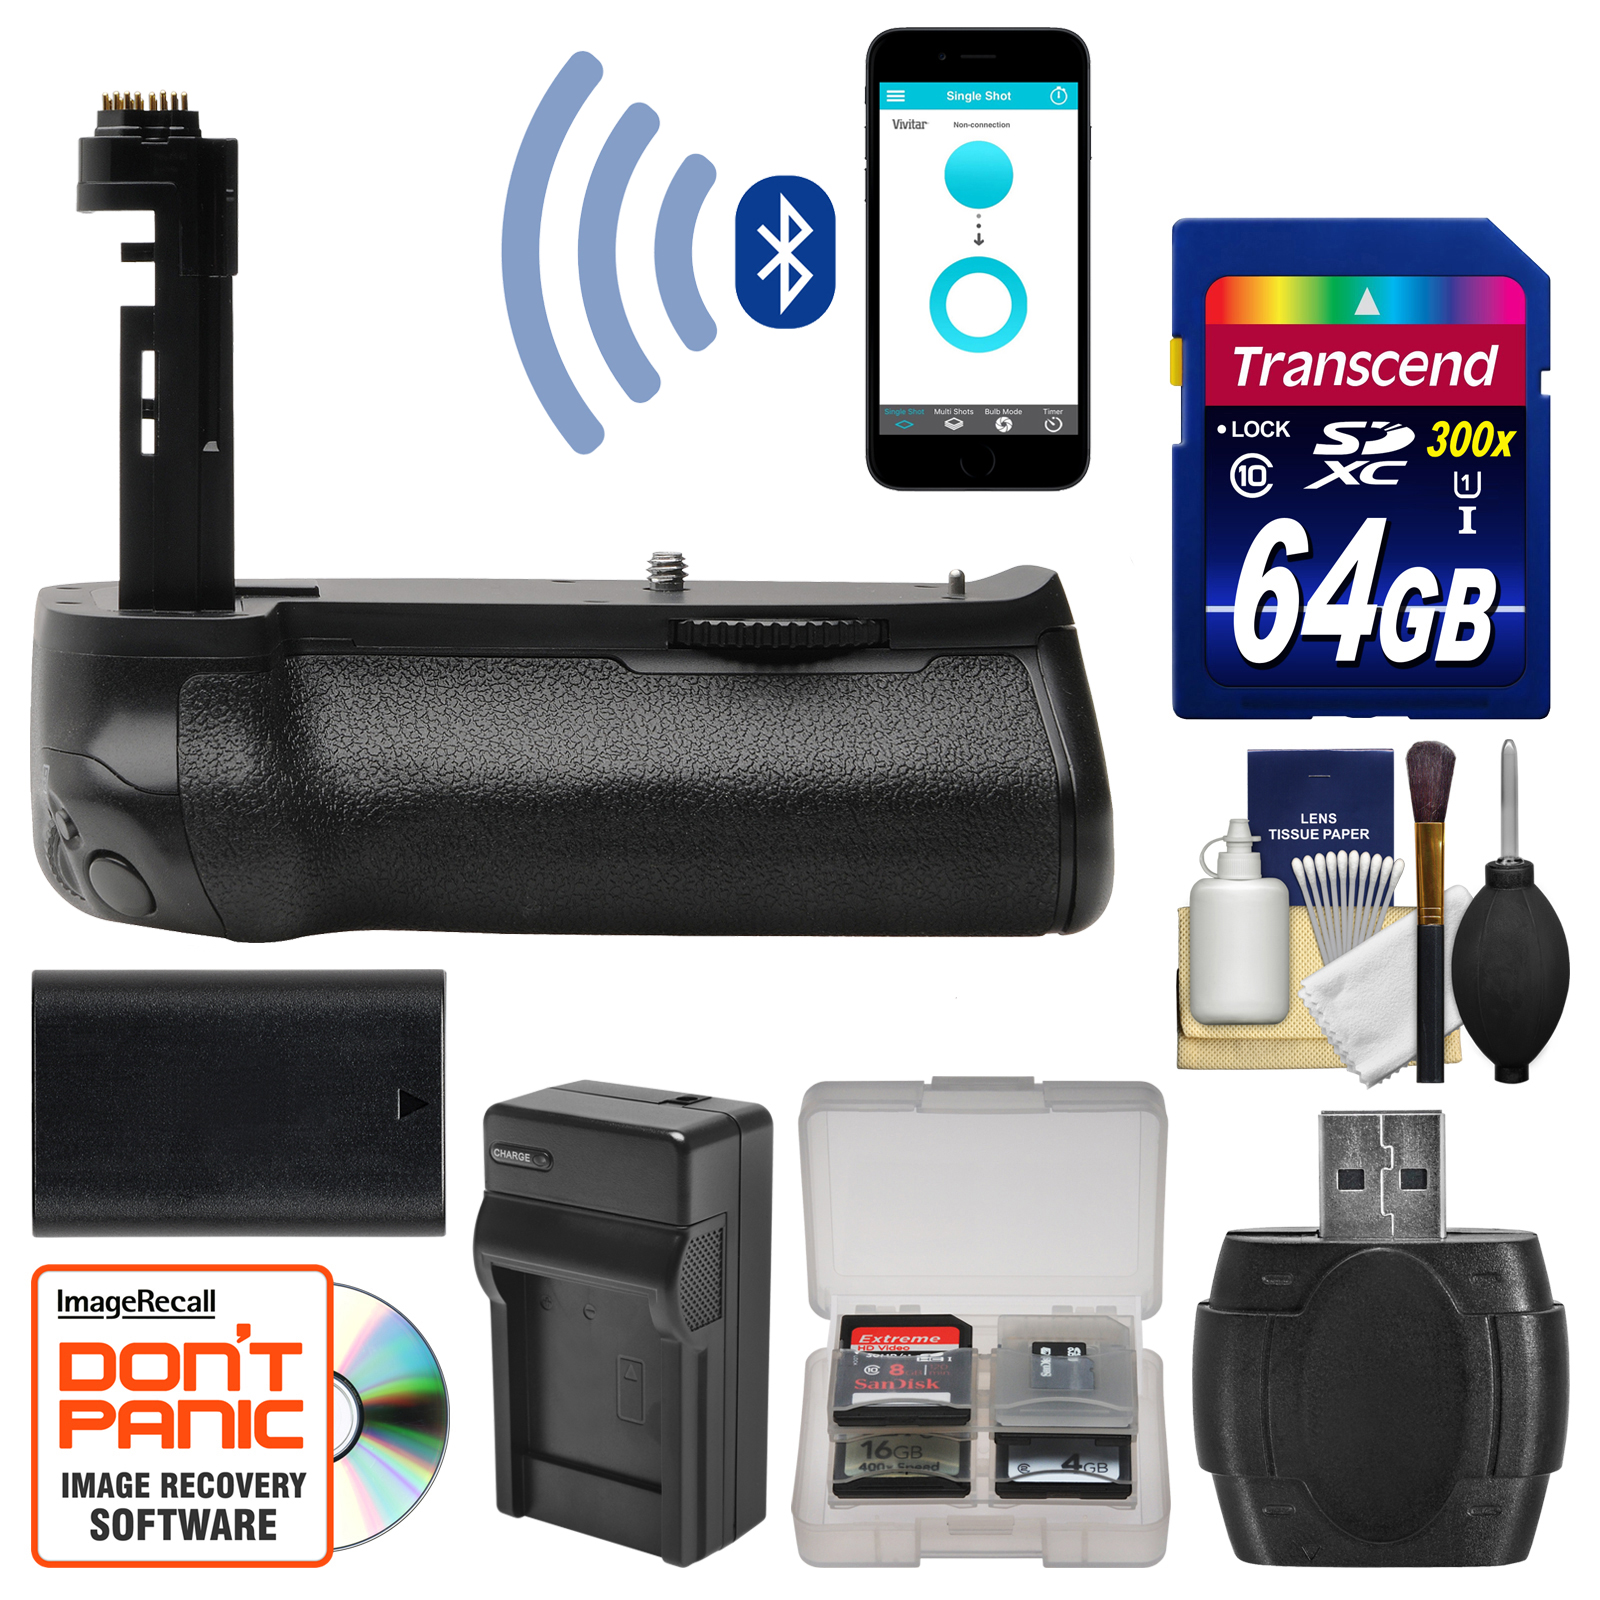 Vivitar BG-E16 Smart Bluetooth Smartphone Control Battery Grip for EOS 7D Mark II DSLR Camera with 64GB Card +... by Vivitar